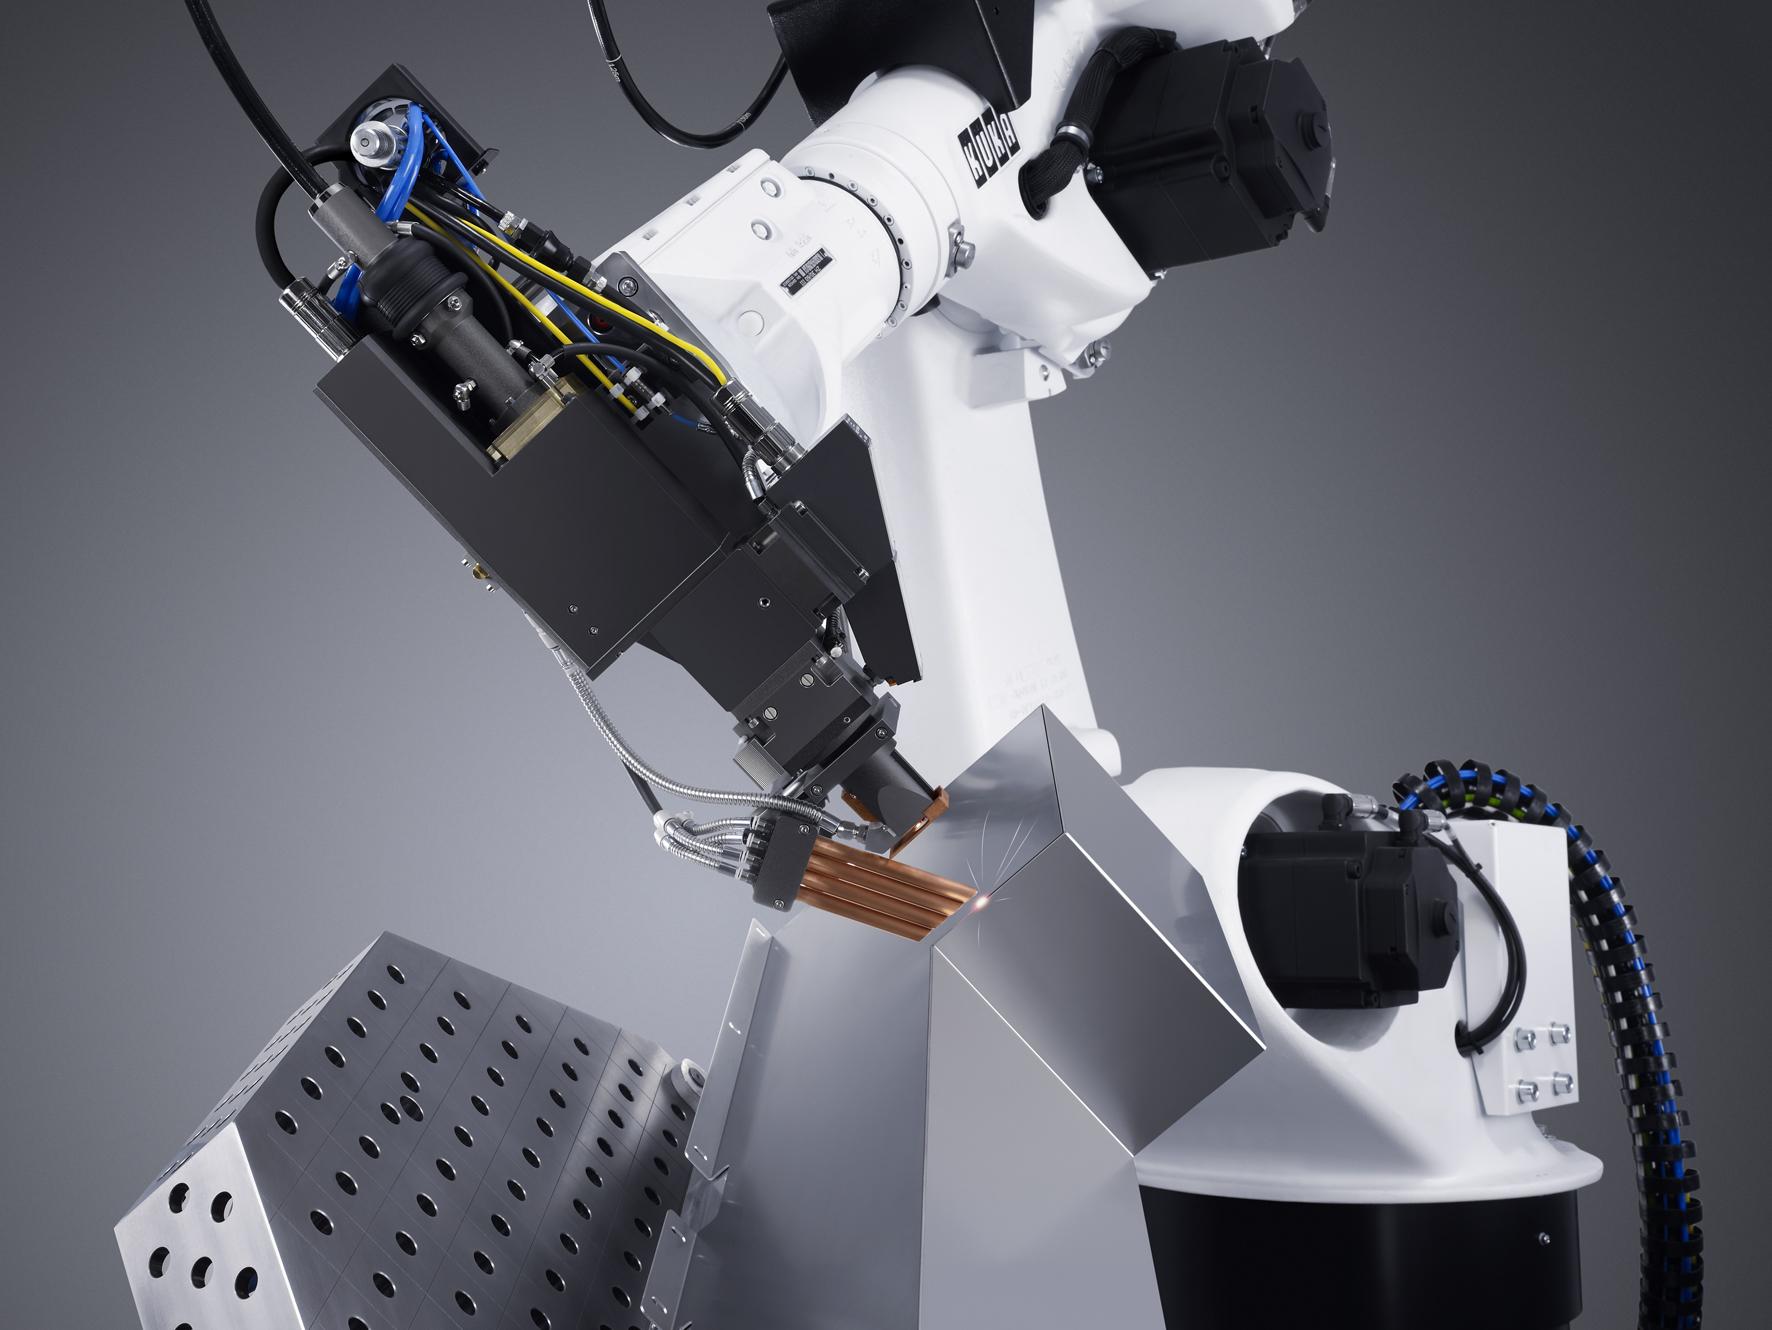 The Next Big Thing in Sheet Metal Fabrication